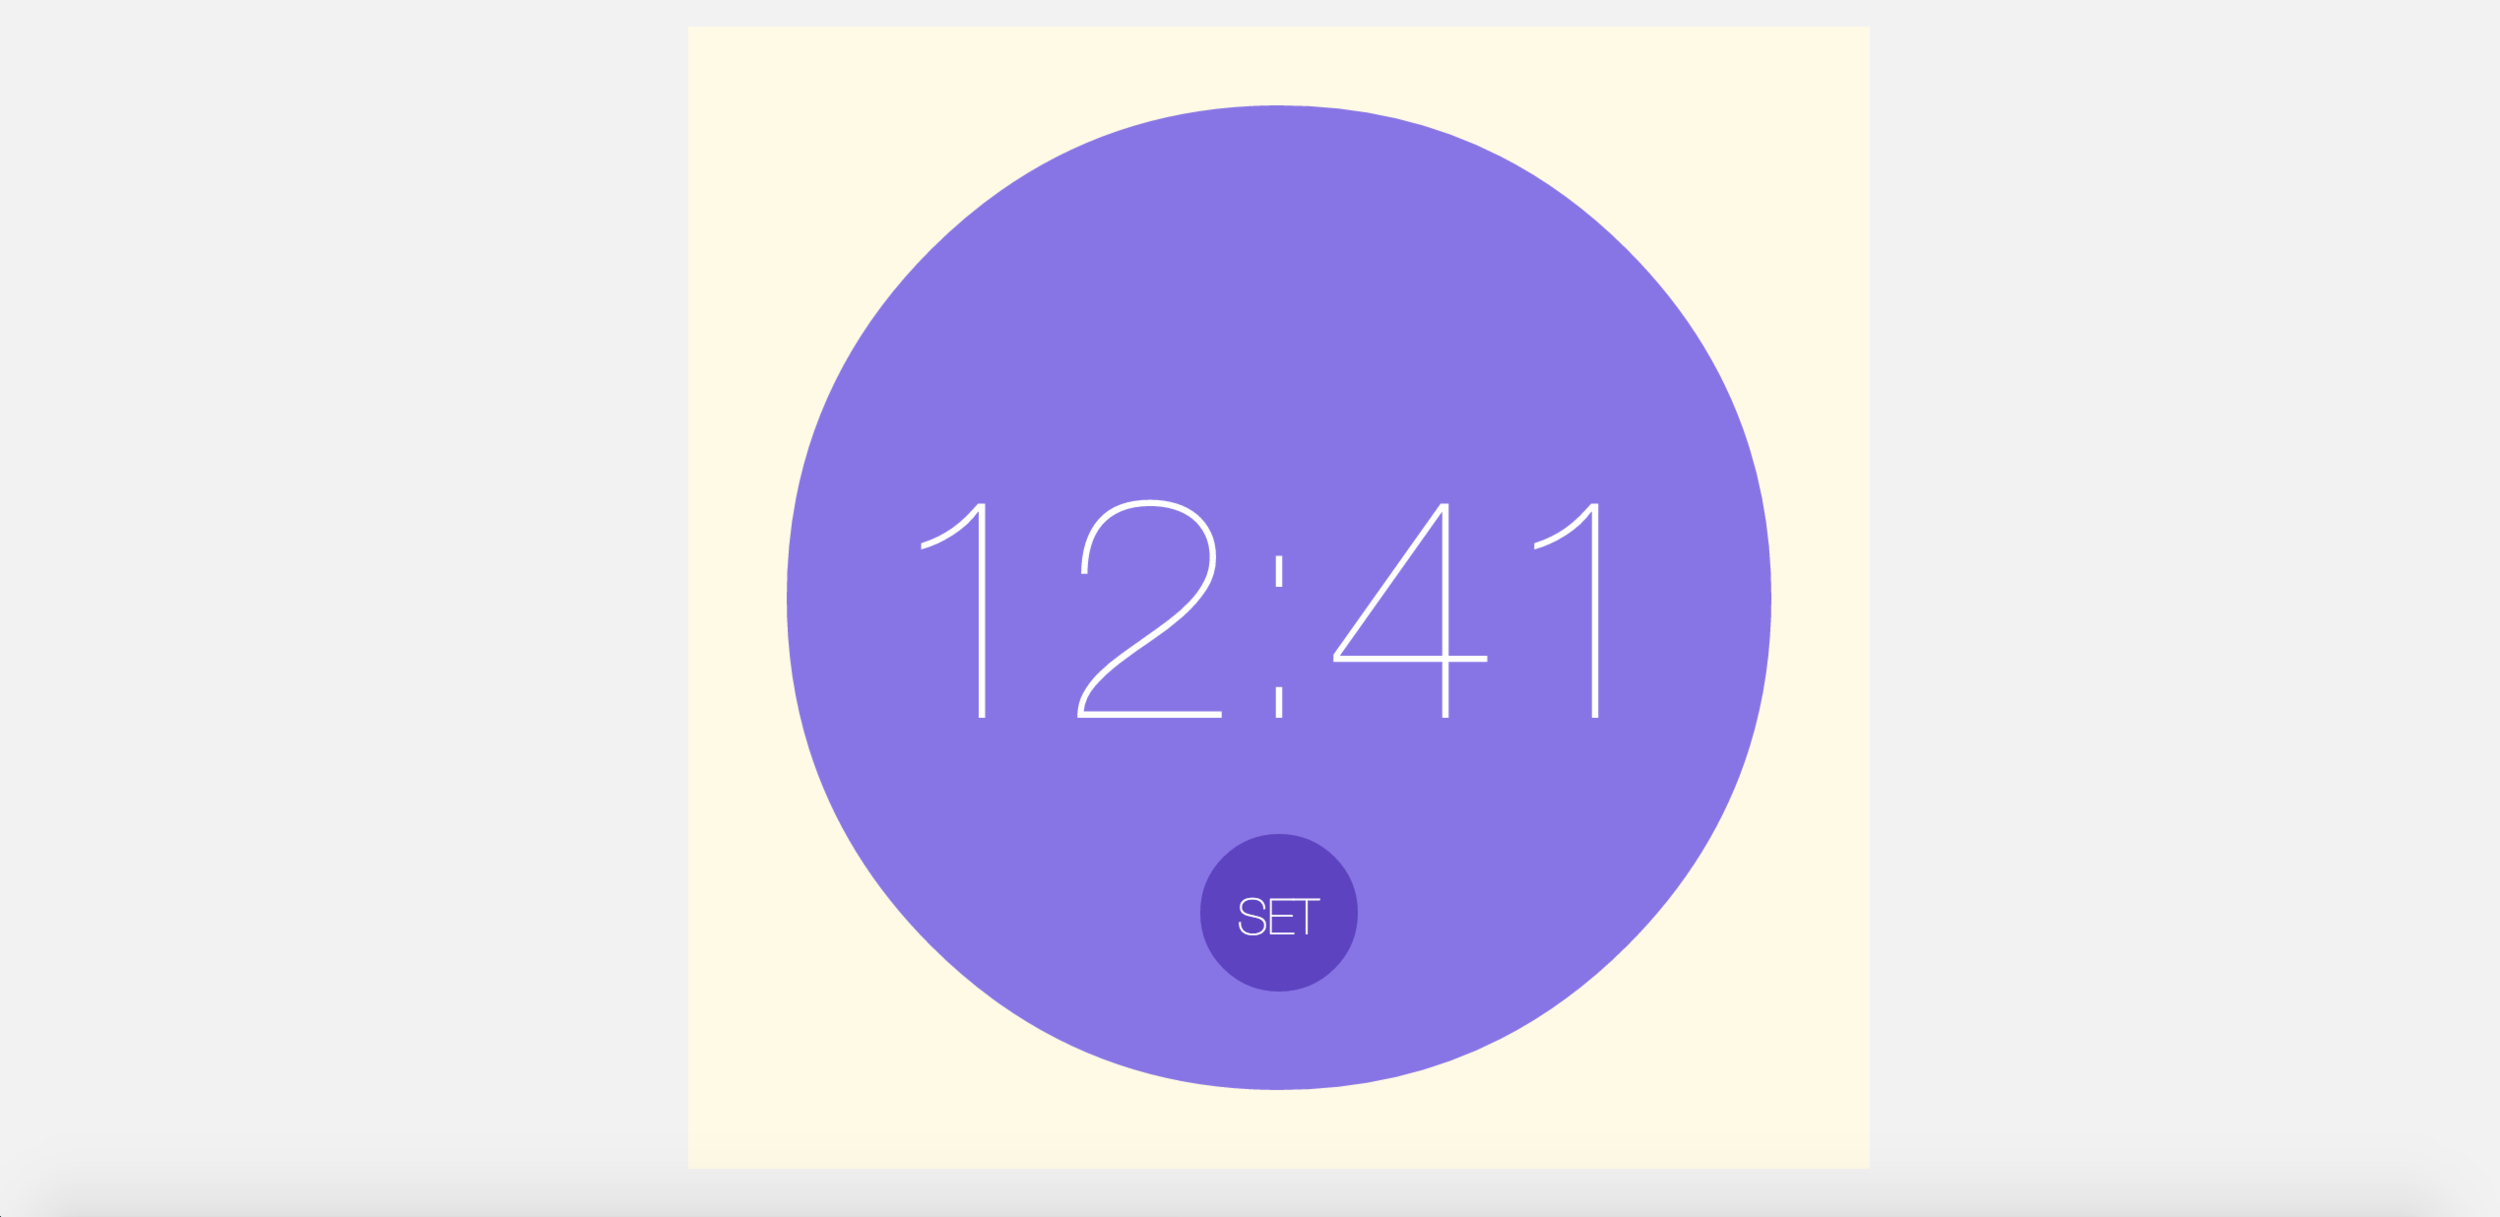 People can hit SET to set alarm.